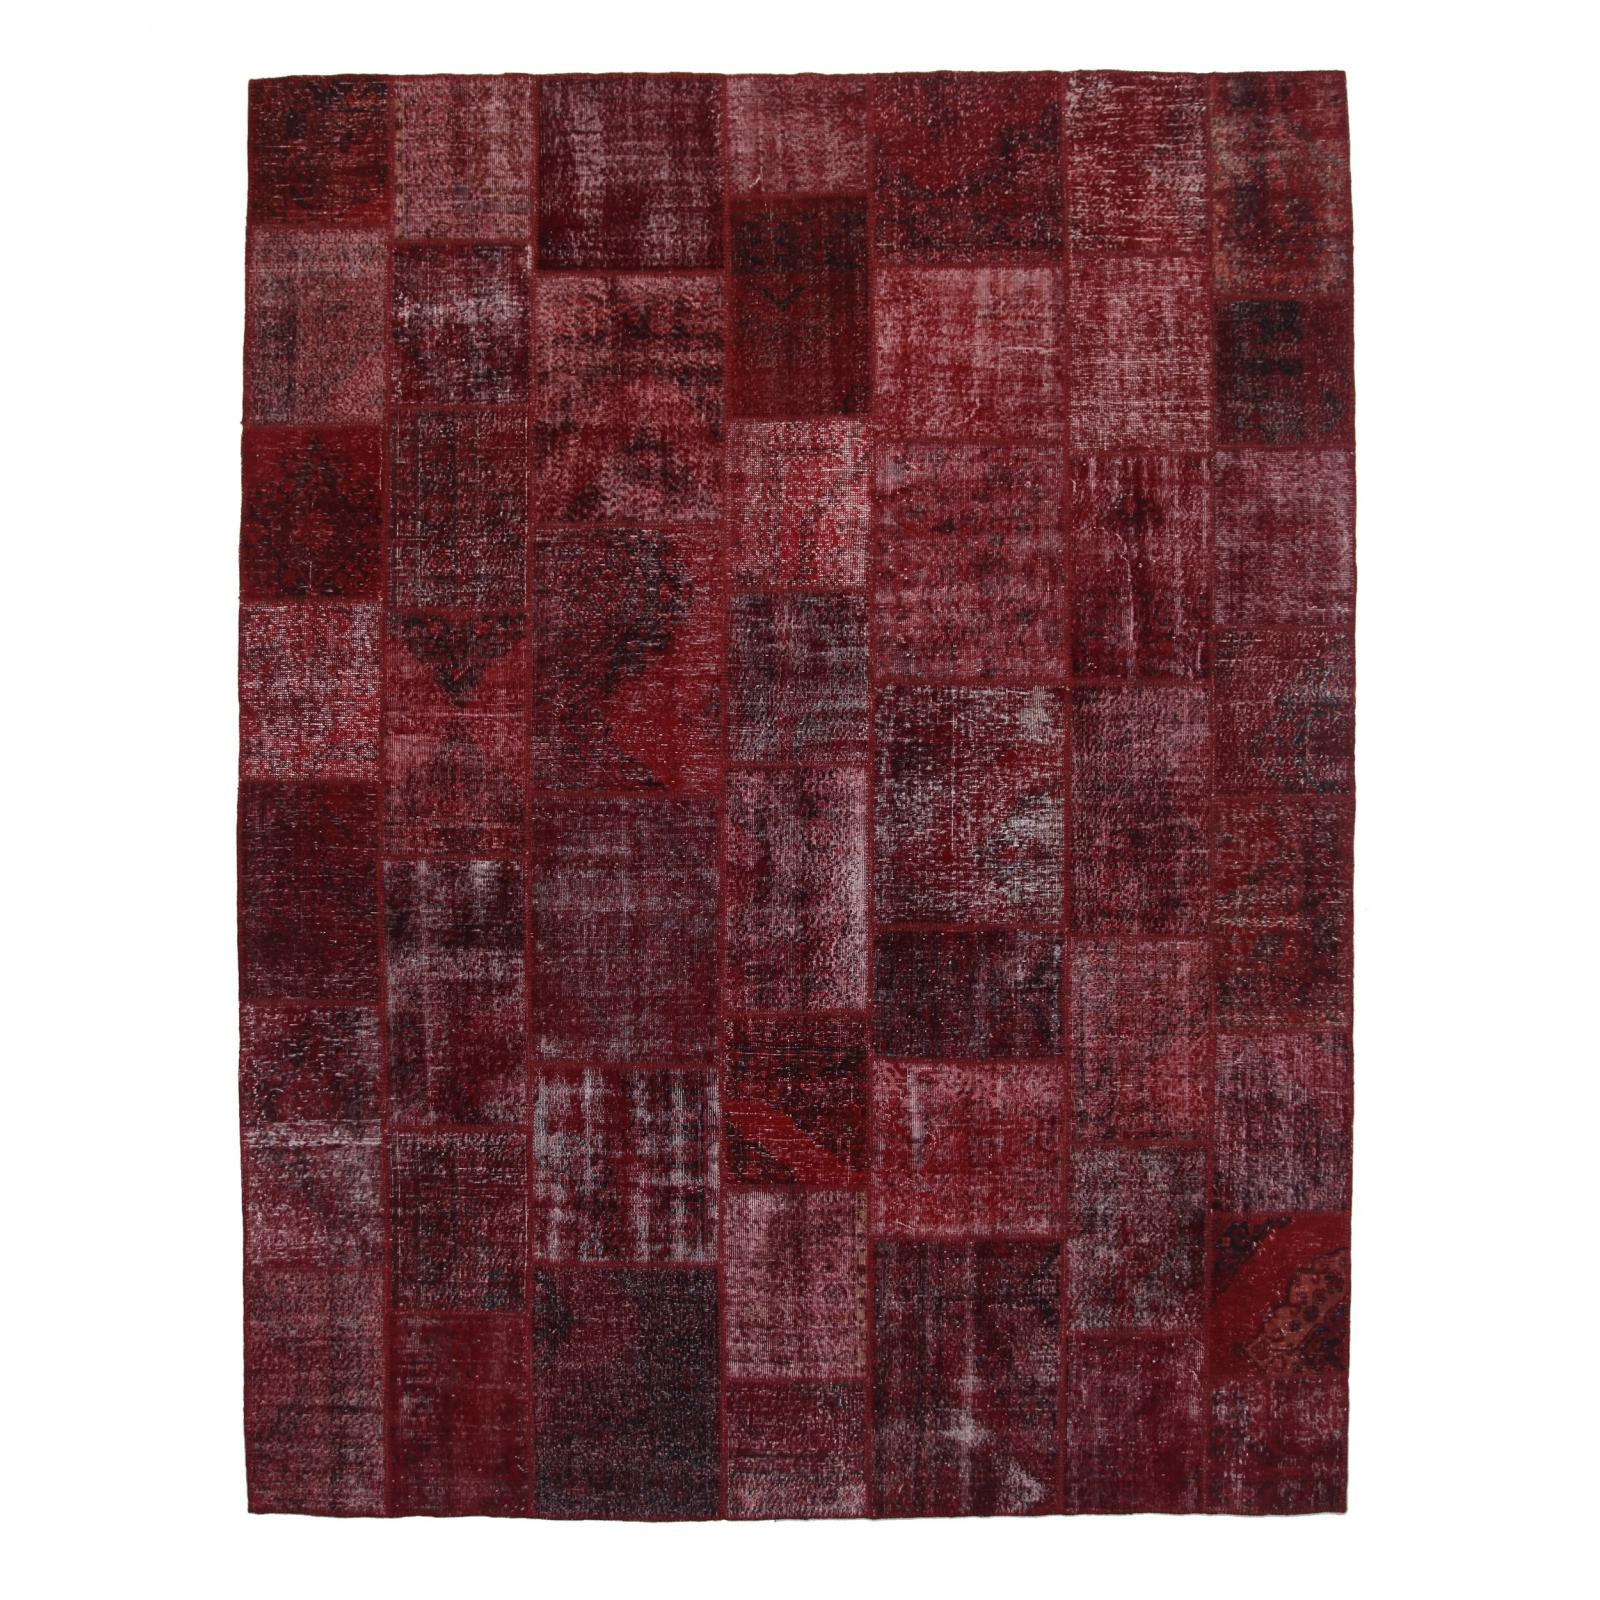 bordeaux rot vintage patchwork flicken teppich 306x400cm. Black Bedroom Furniture Sets. Home Design Ideas